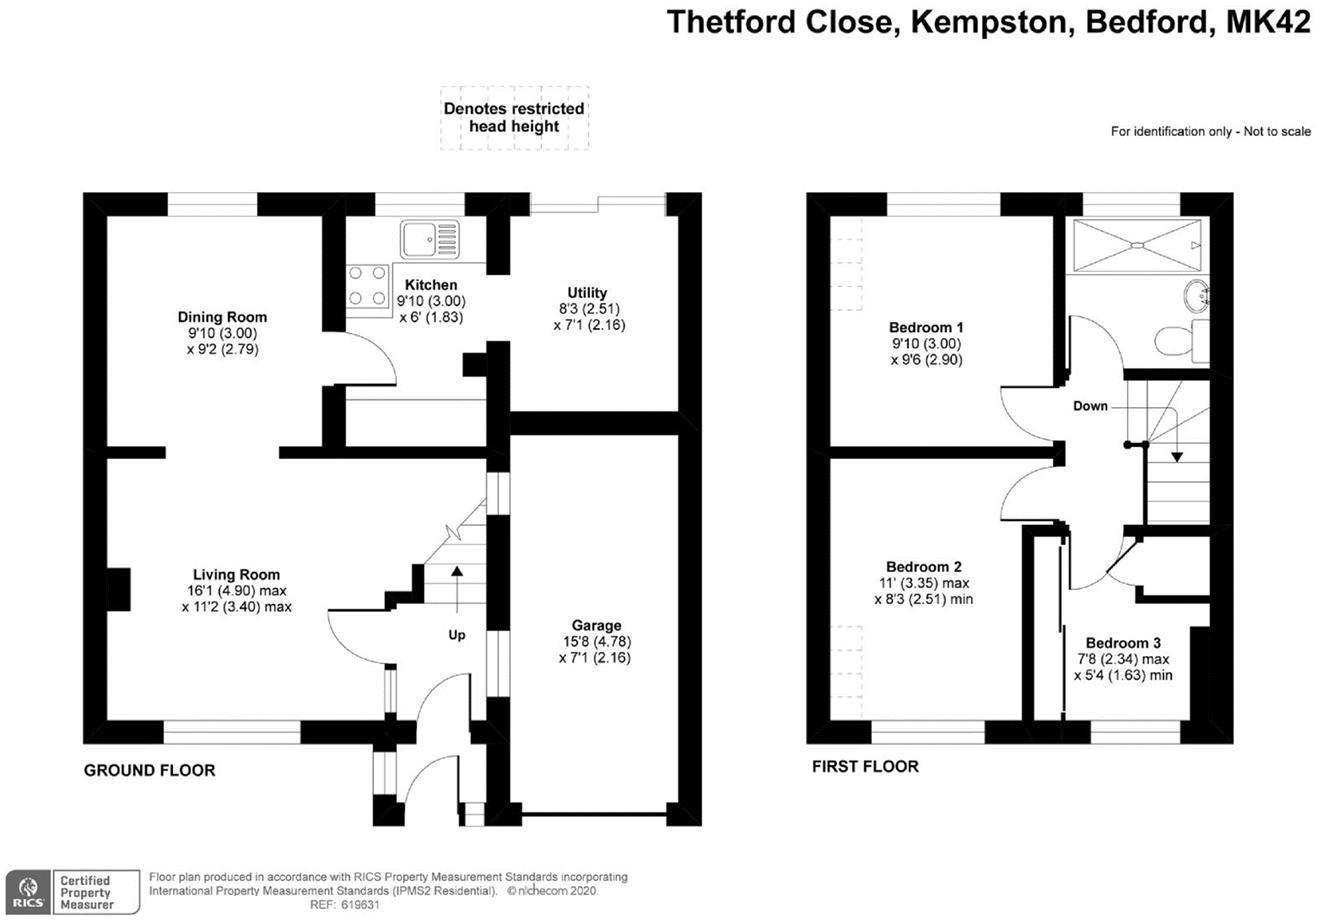 Thetford Close Kempston